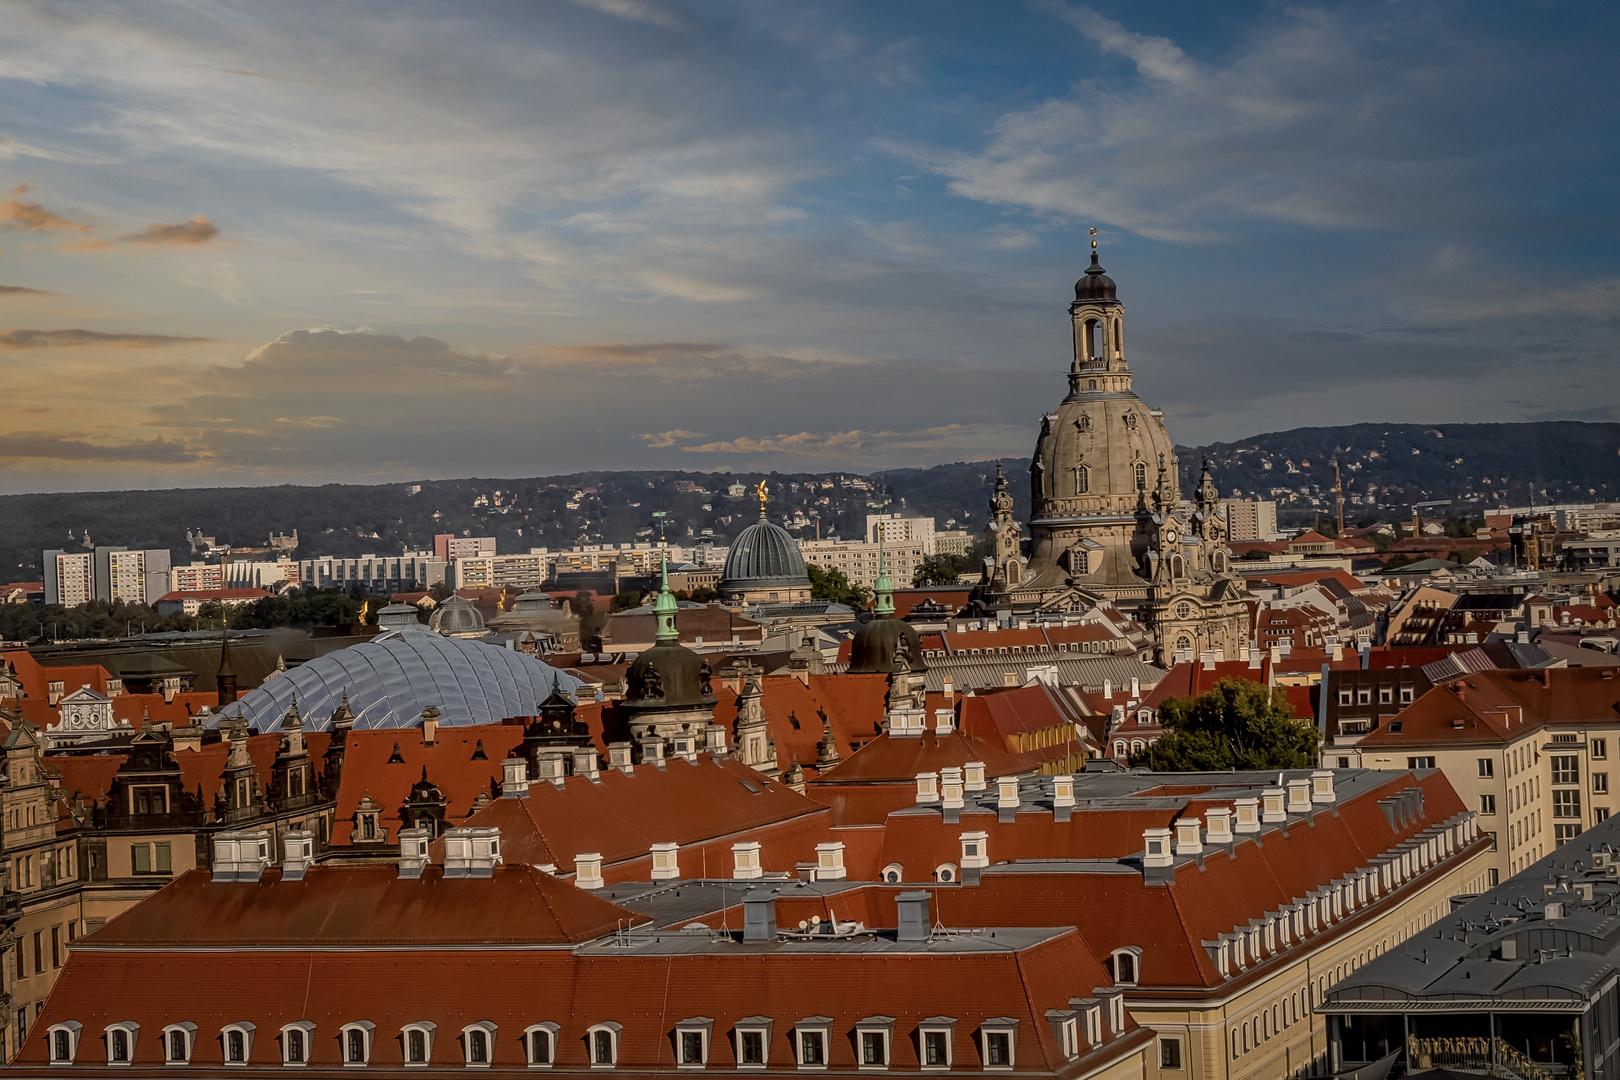 Spektakulärer Blick auf Dresden